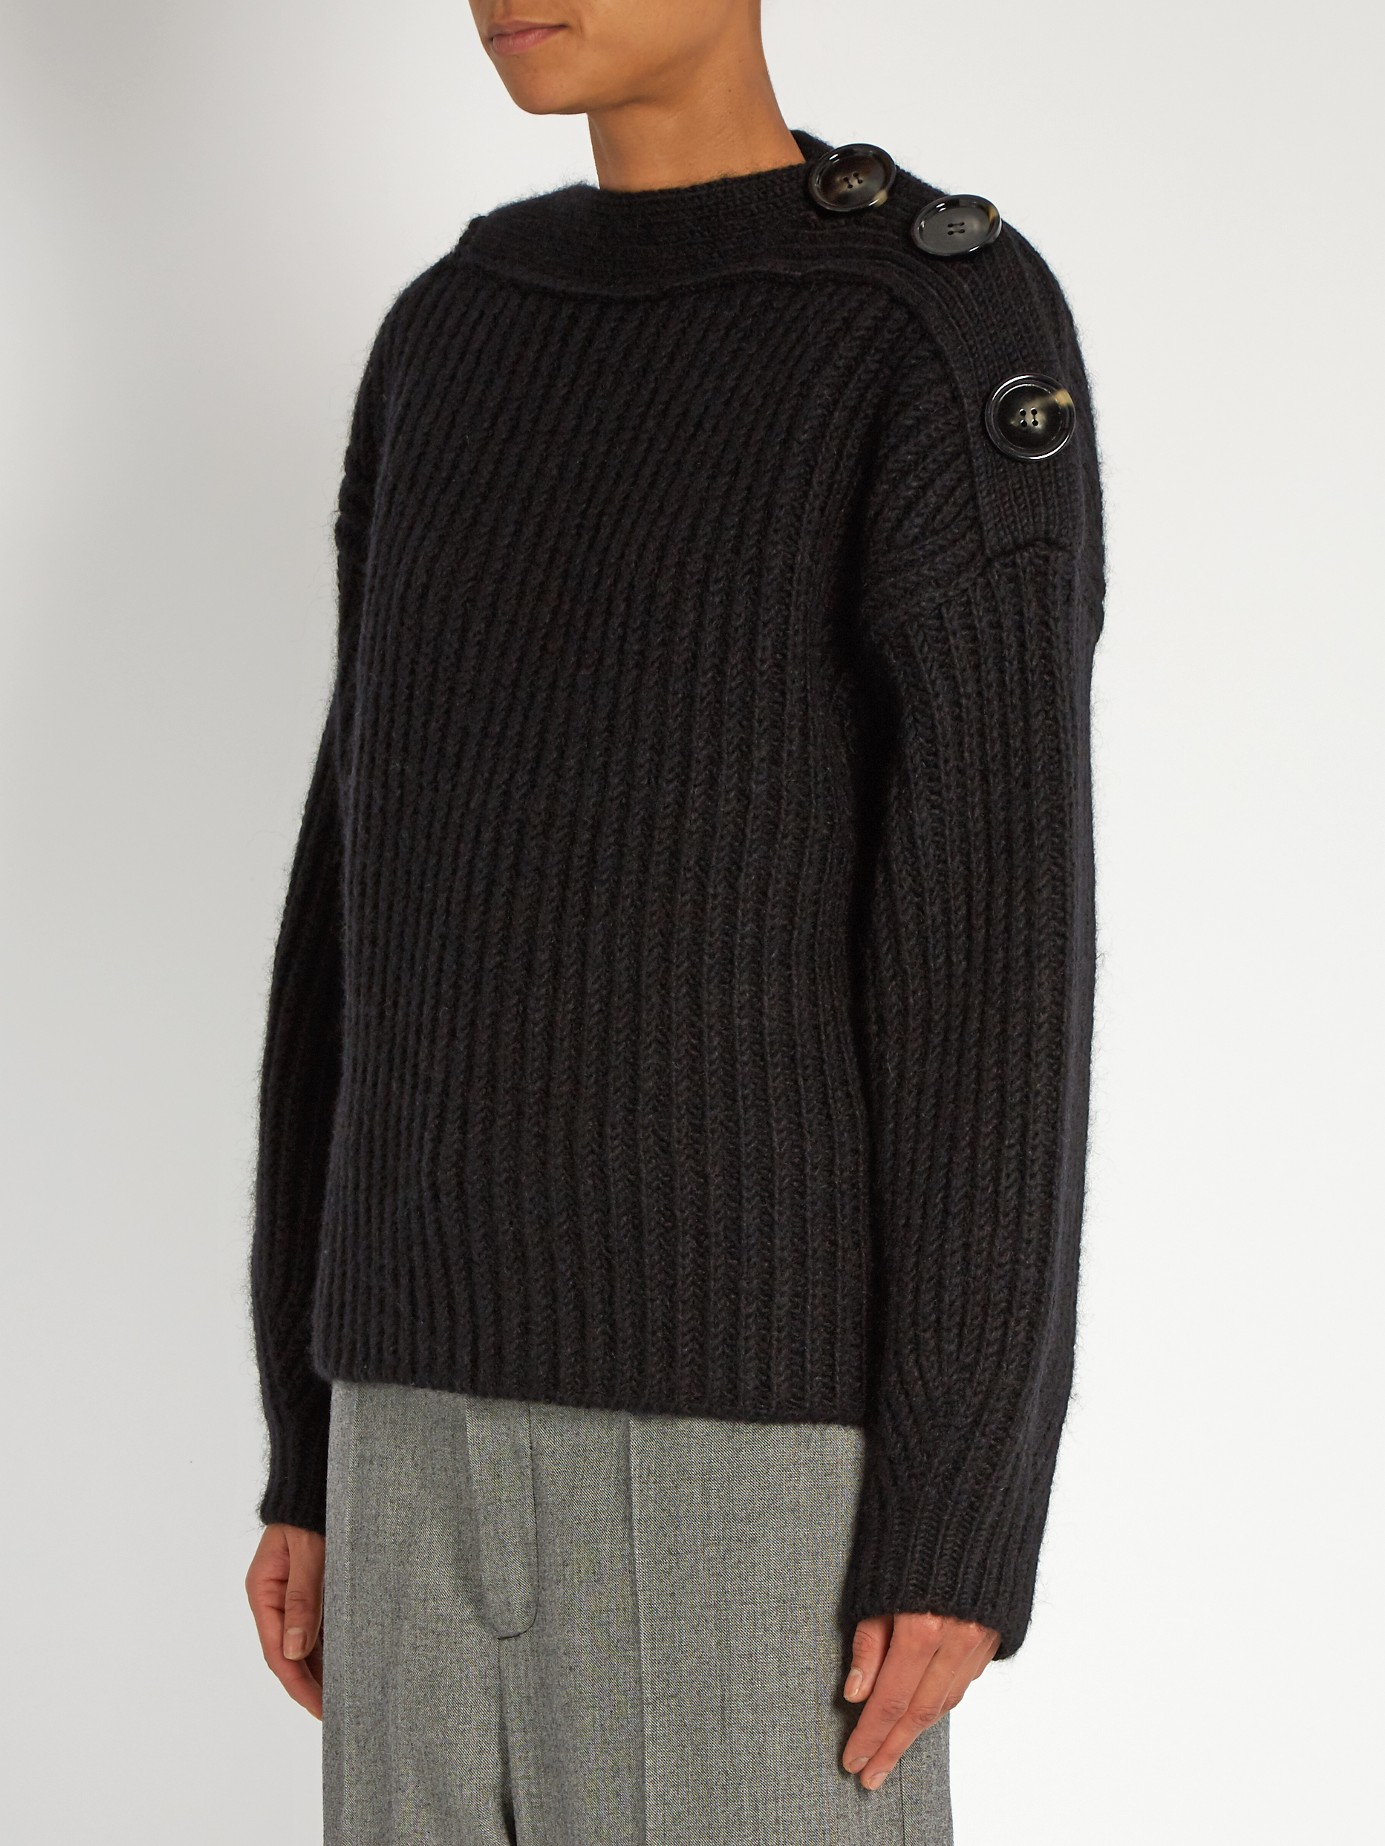 Acne Studios Holden Boat-neck Wool-blend Sweater in Black for Men